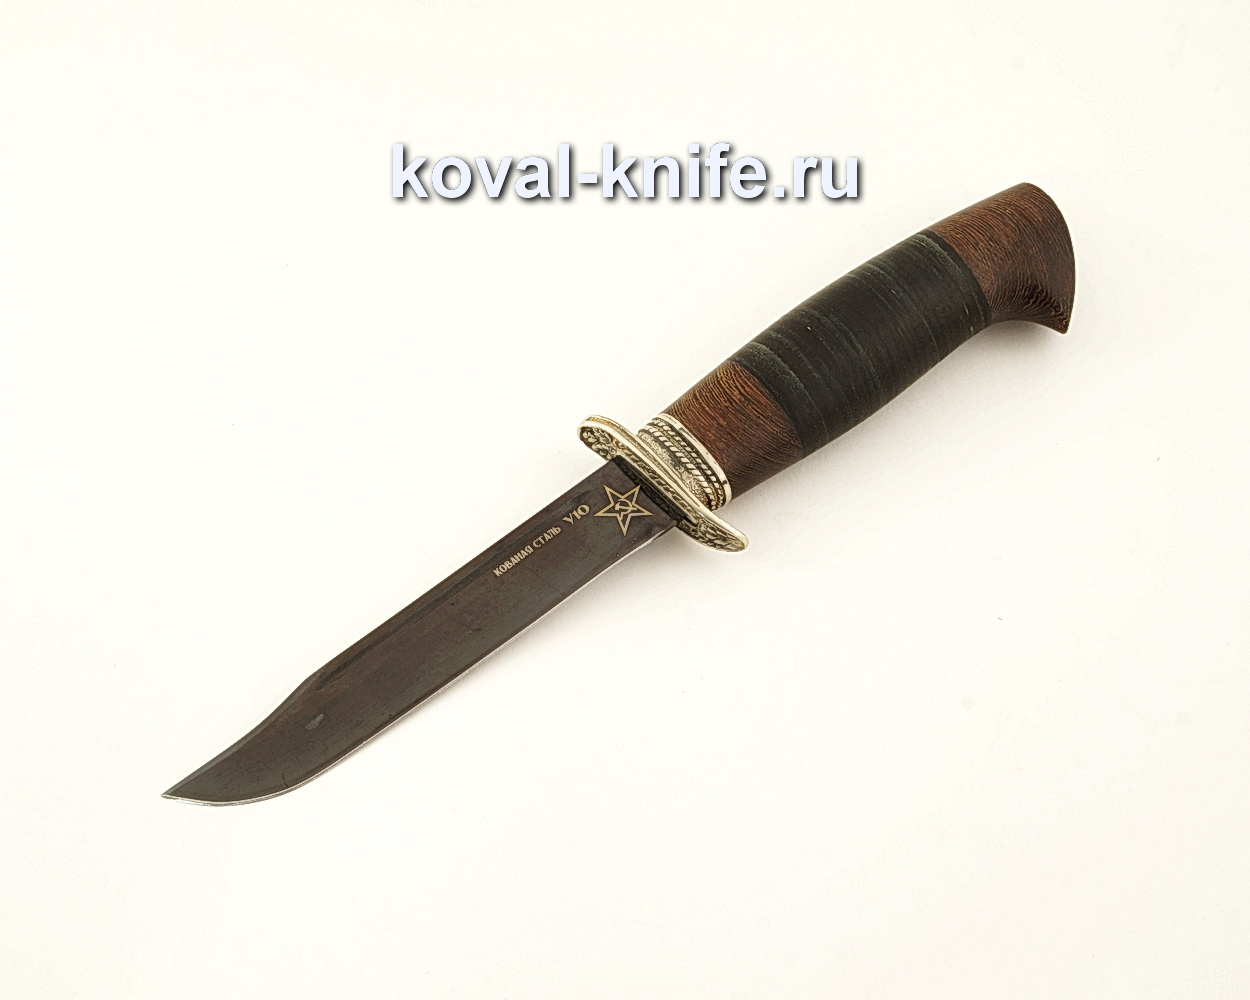 Нож Штрафбат — реплика ножа НР40 из кованой стали У10 с рукоятью из кожи  A619